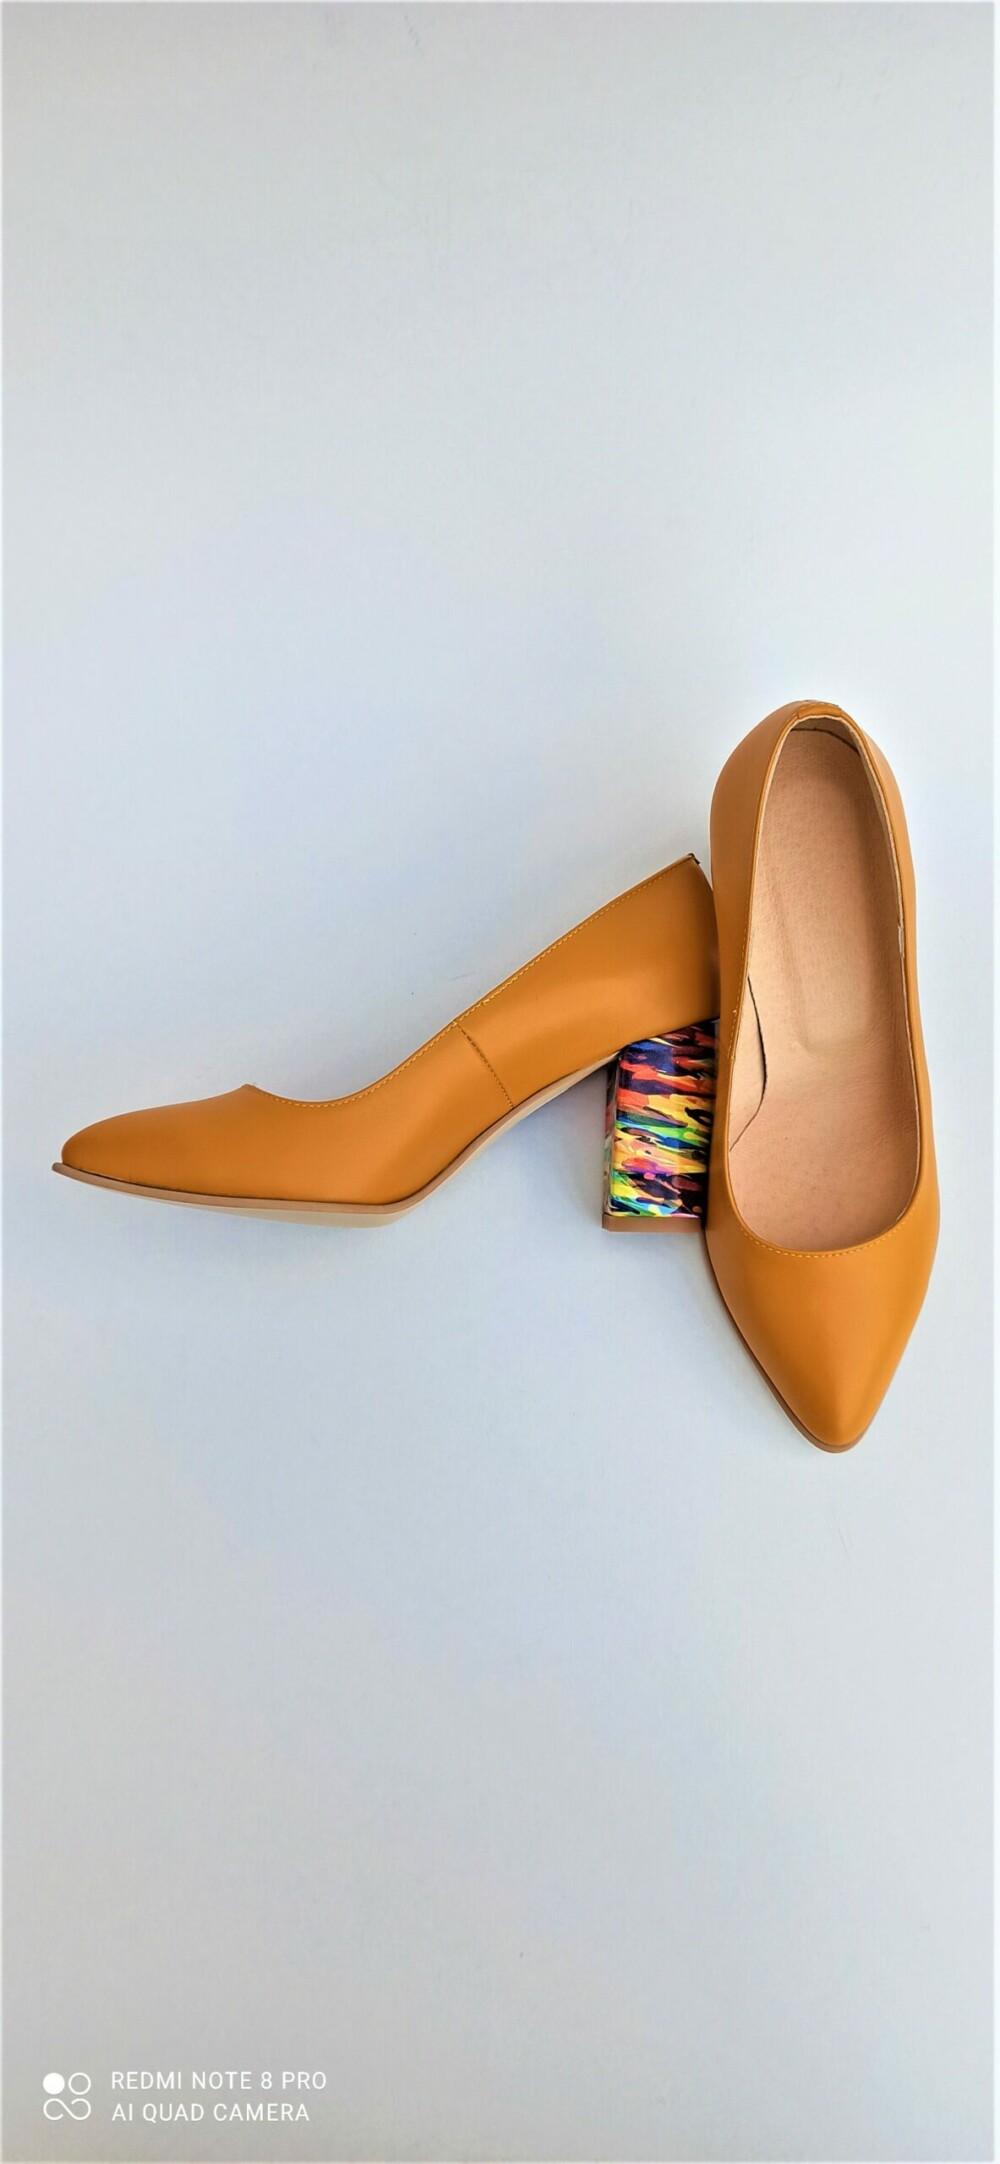 Pantofi portocalii din piele naturala